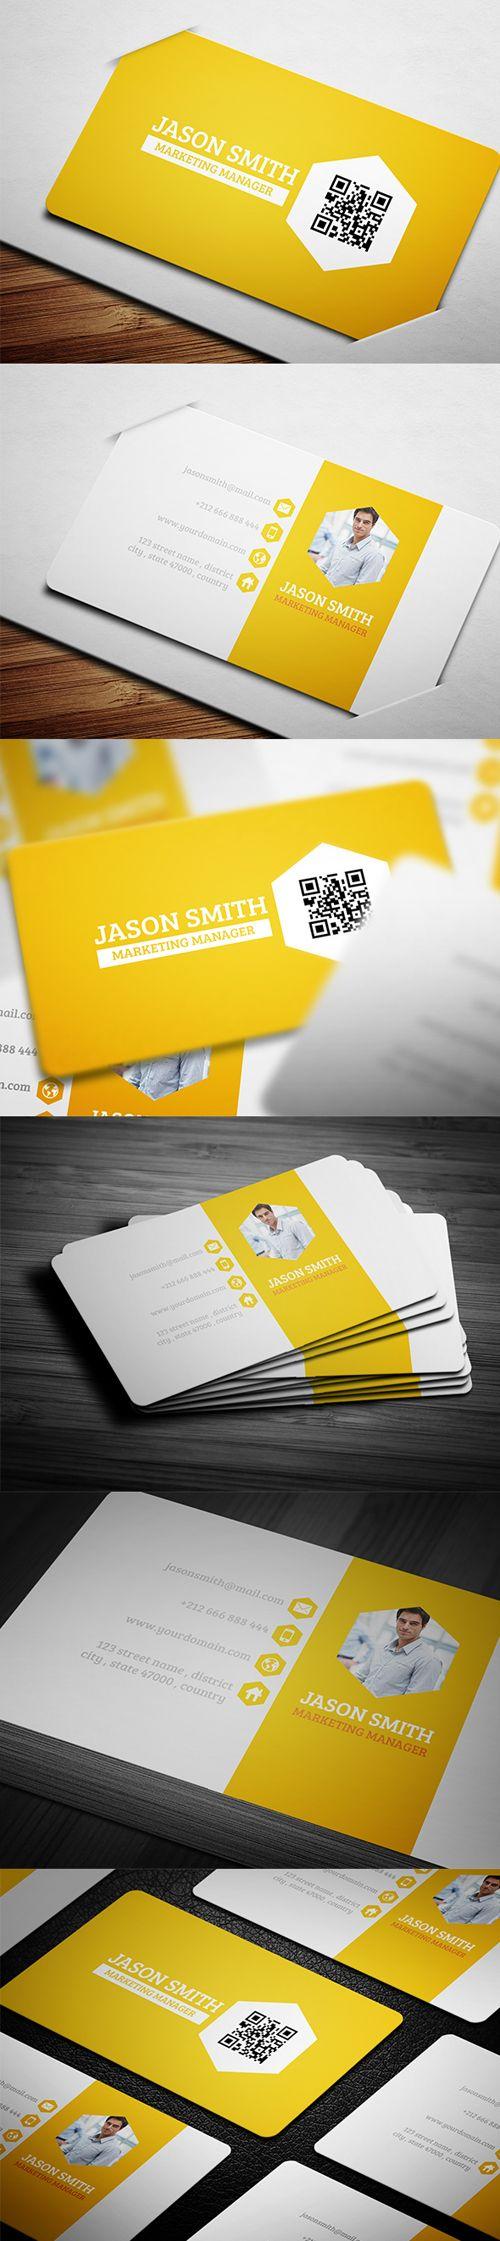 business cards template design - 4 #businesscards #businesscardtemplates #creativebusinesscards